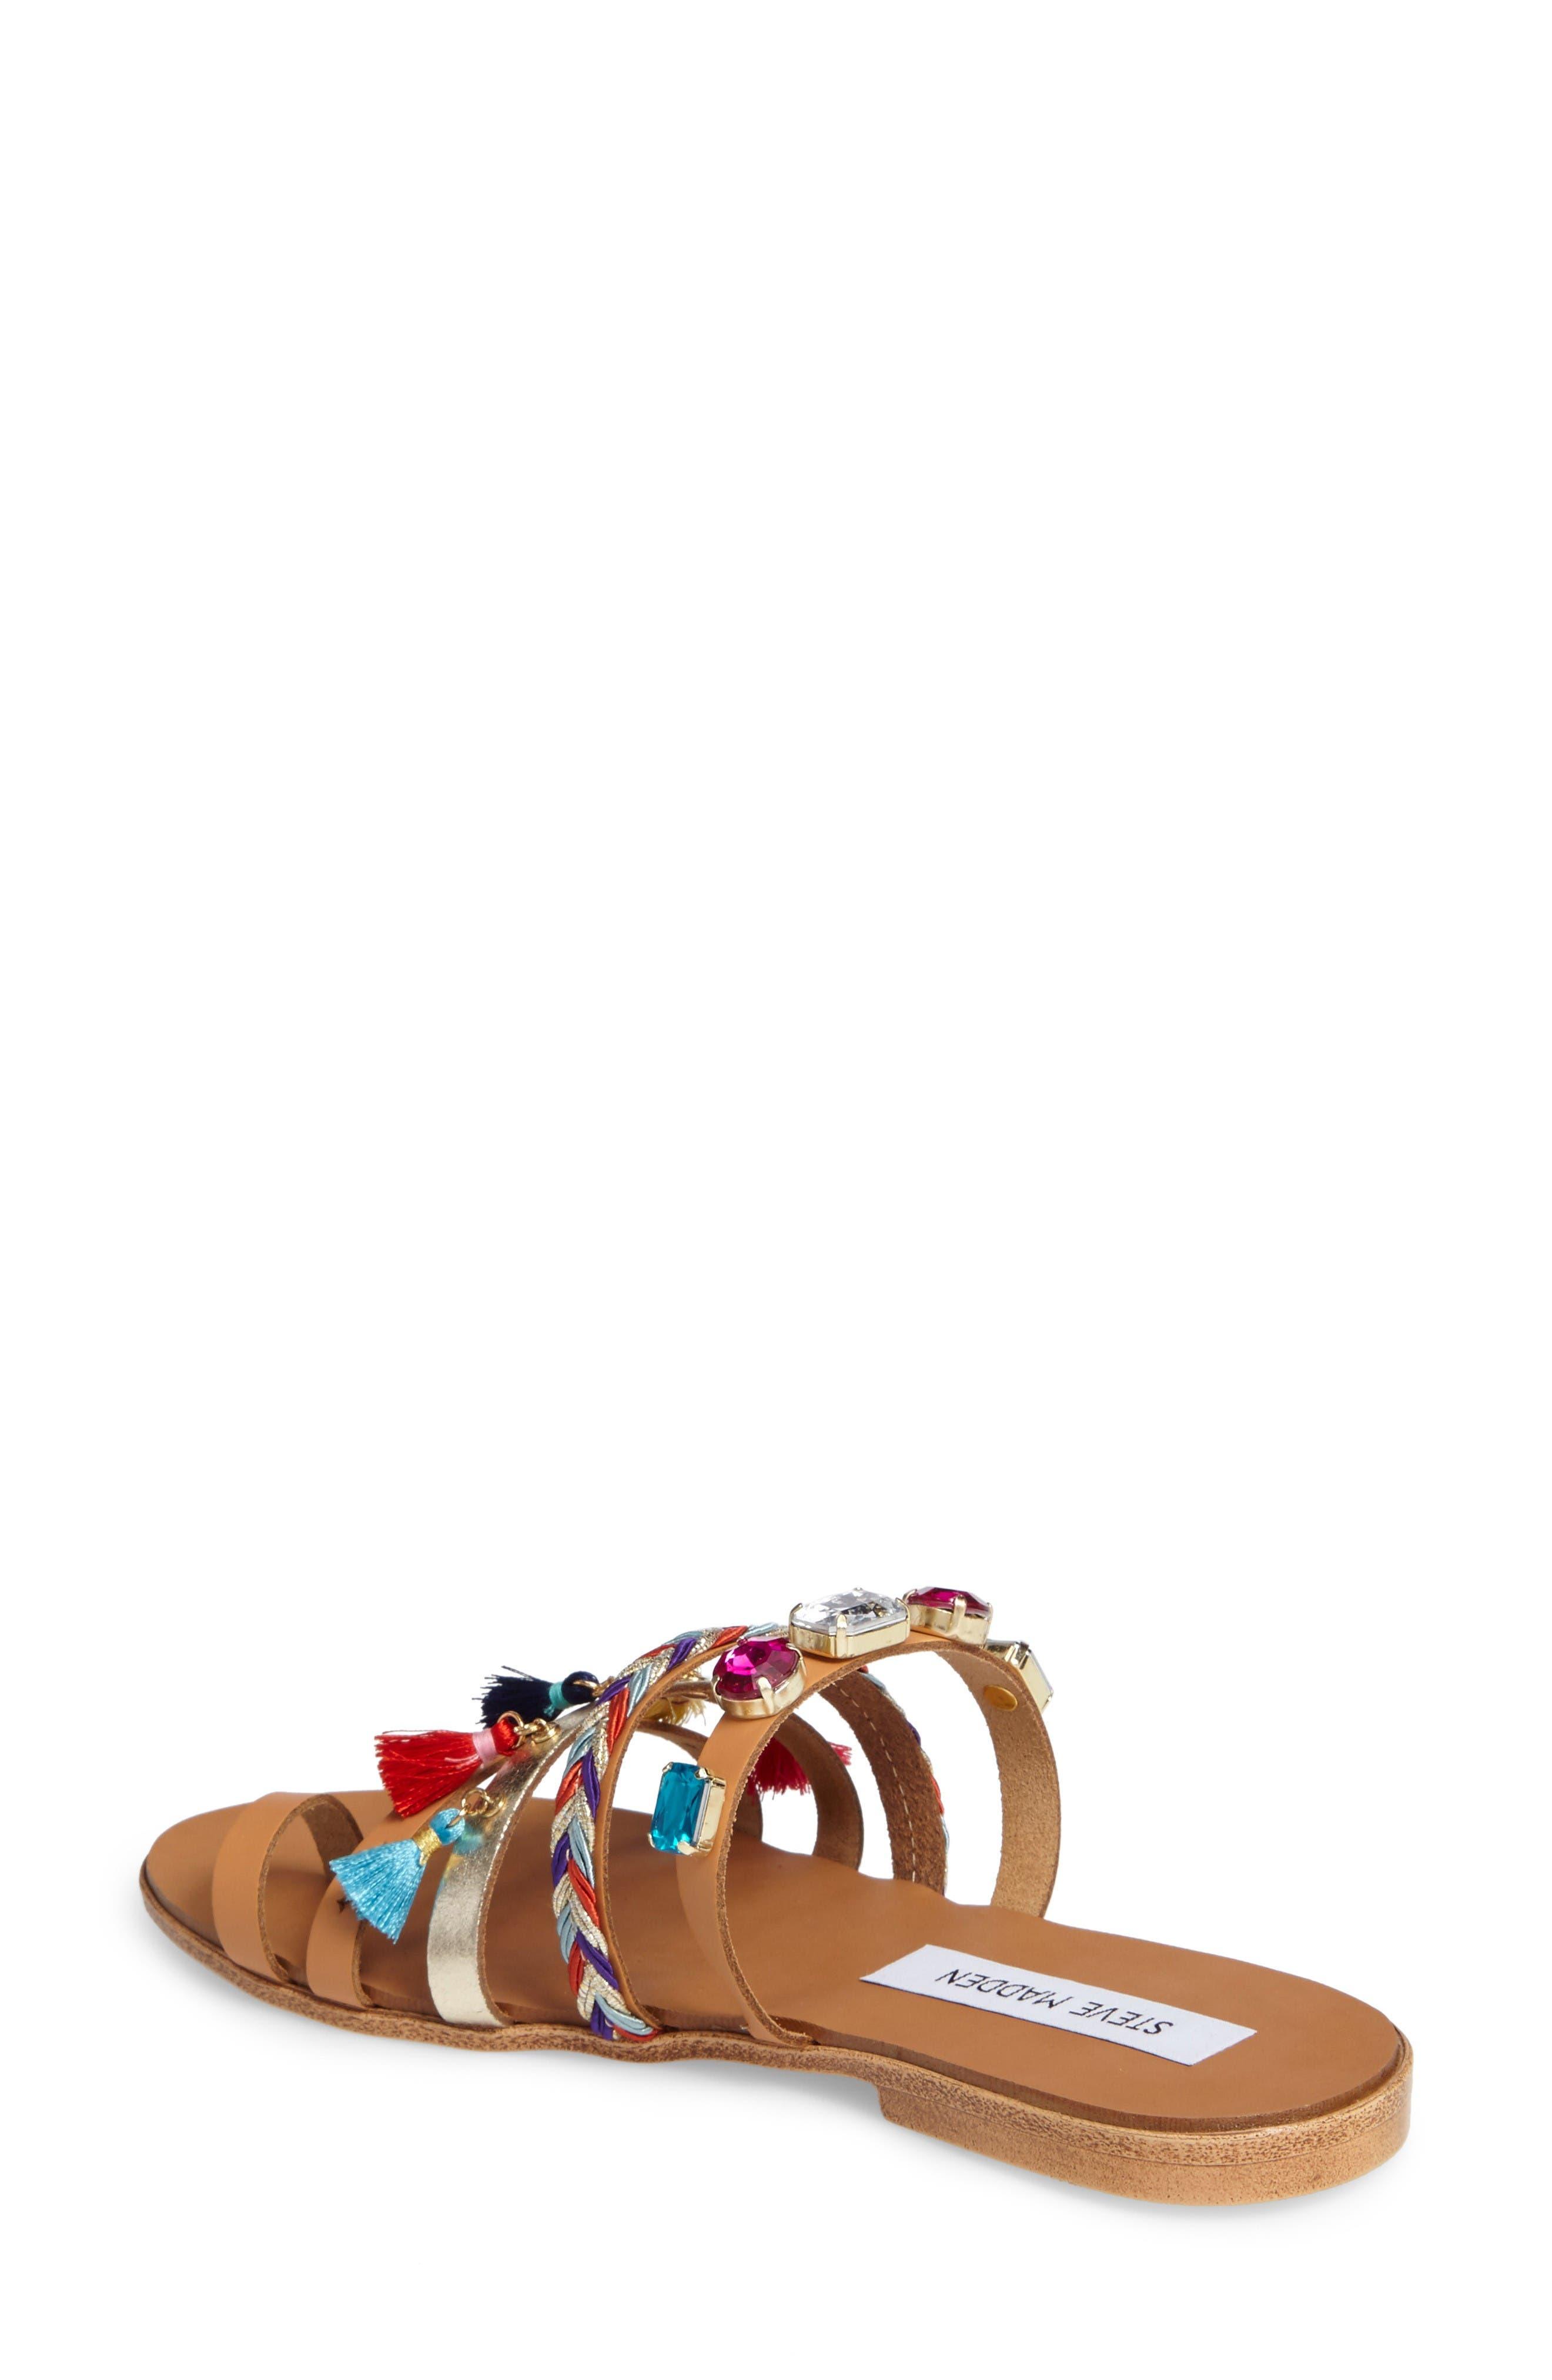 Alternate Image 2  - Steve Madden Cary Embellished Sandal (Women)